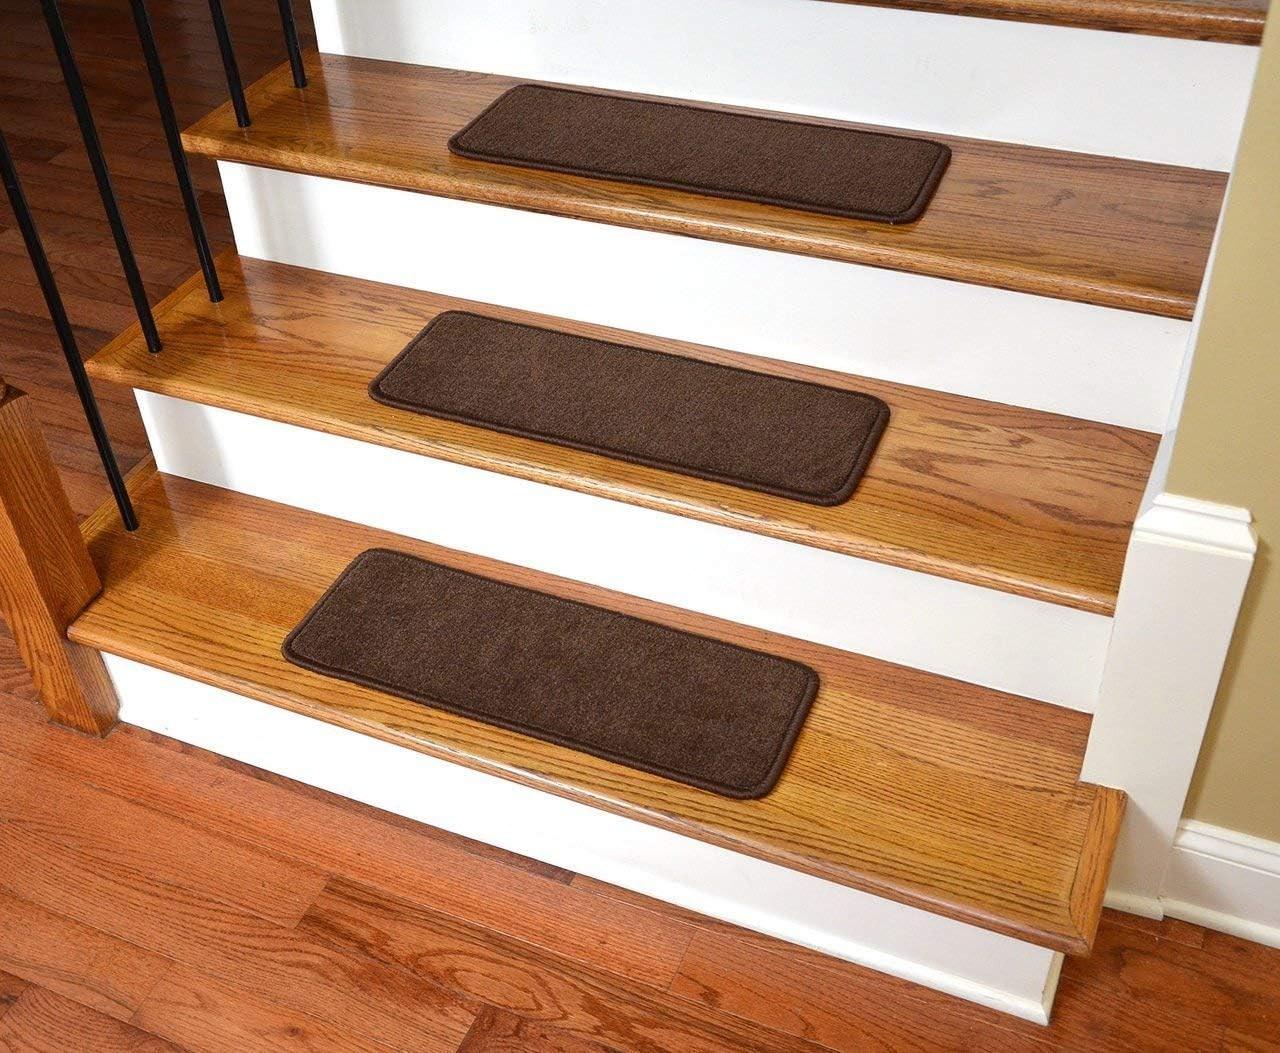 Amazon Com Dean Premium Stair Gripper Non Slip Tape Free Pet | Nylon Carpet For Stairs | Berber Carpet | Non Slip | Tread Covers | Rug | Stairway